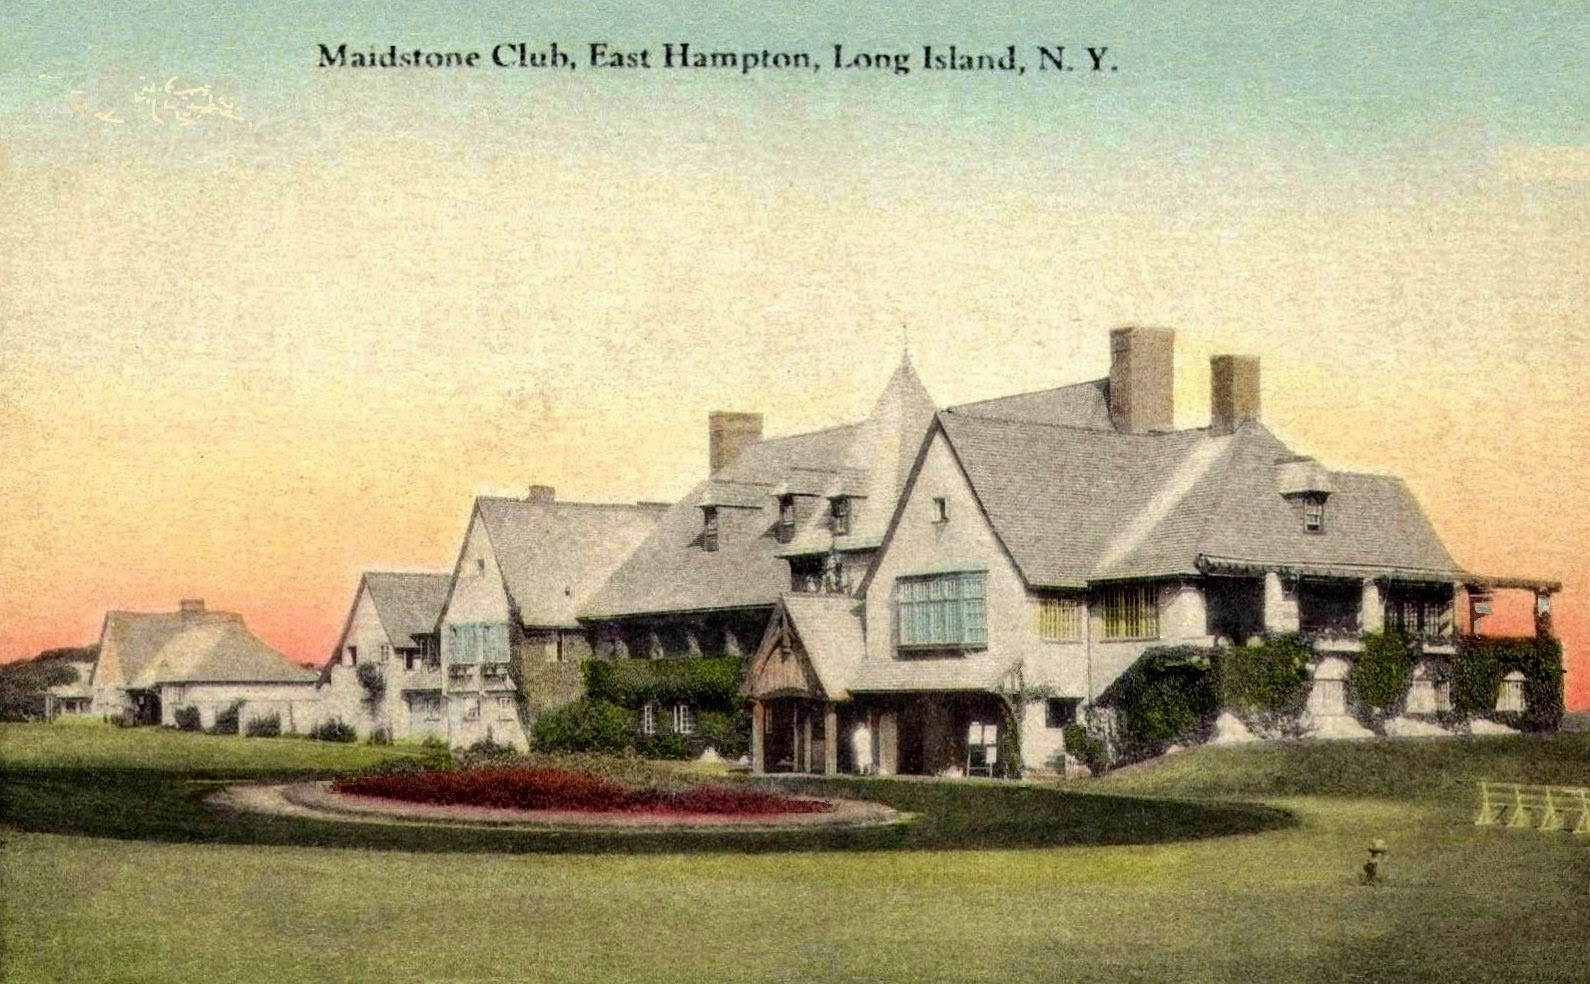 Old Long Island: The Maidstone Club